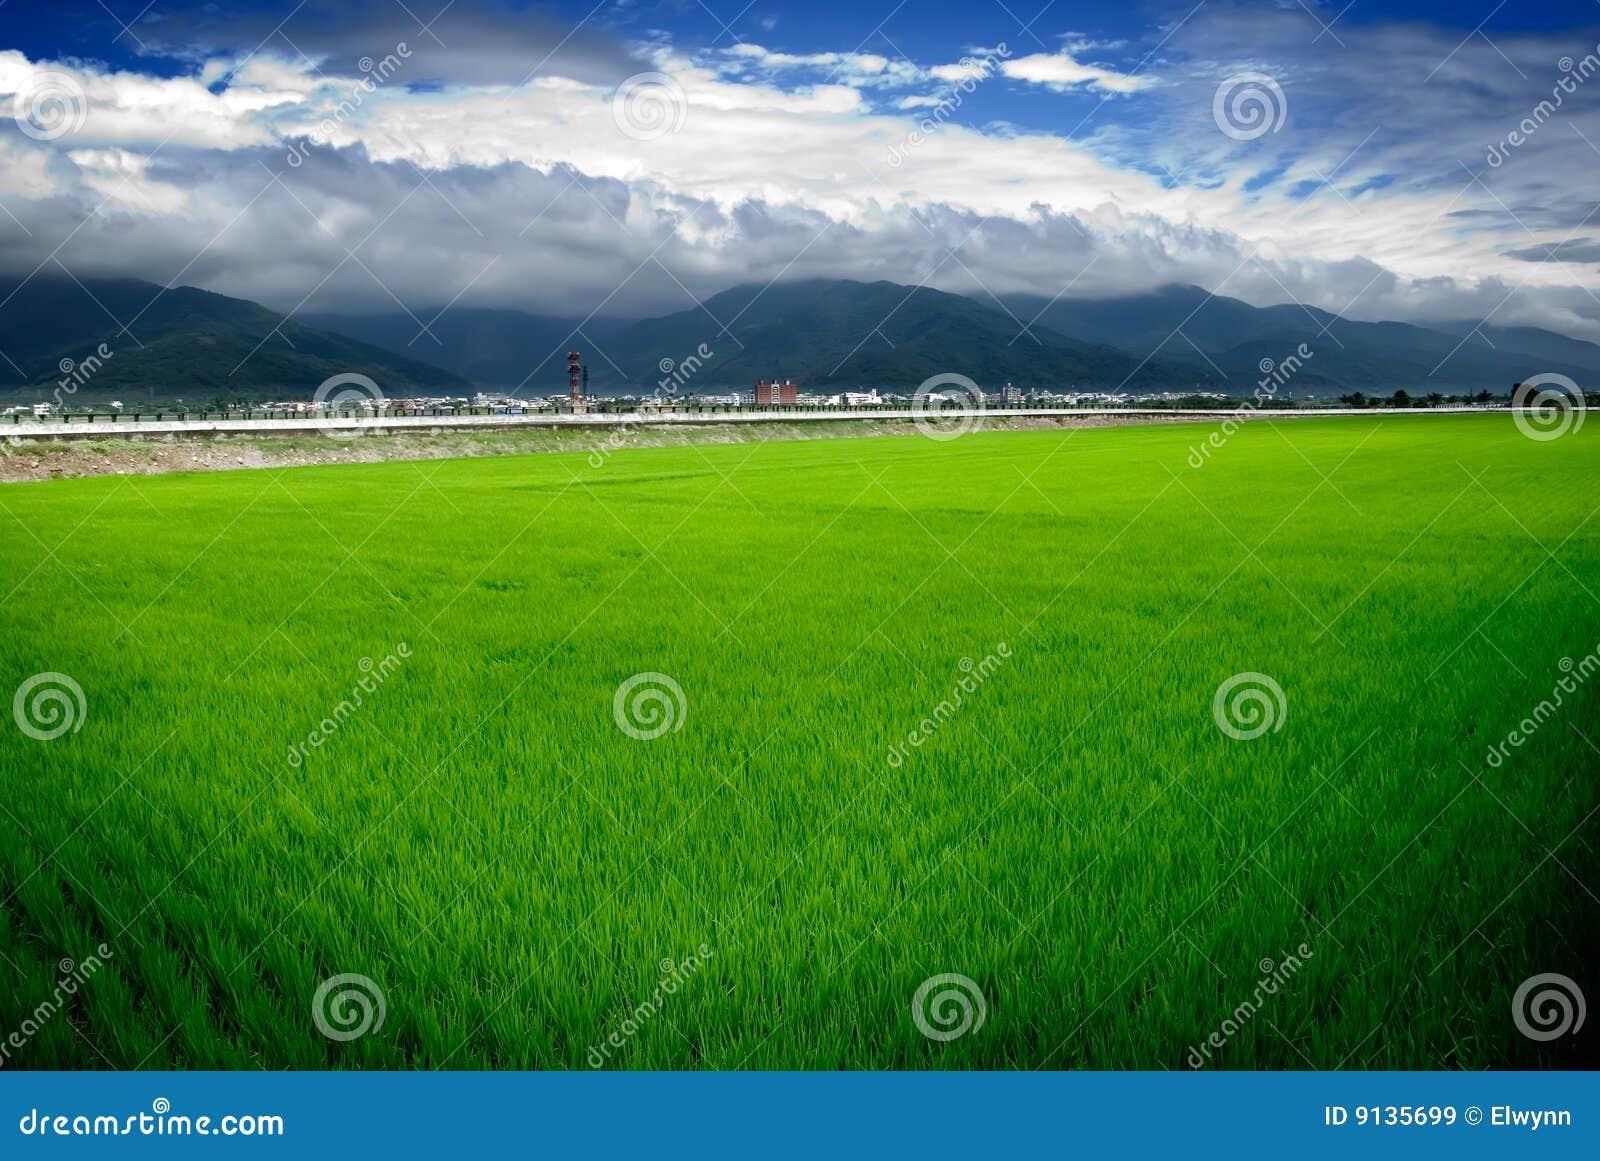 Green rice farm and blue sky